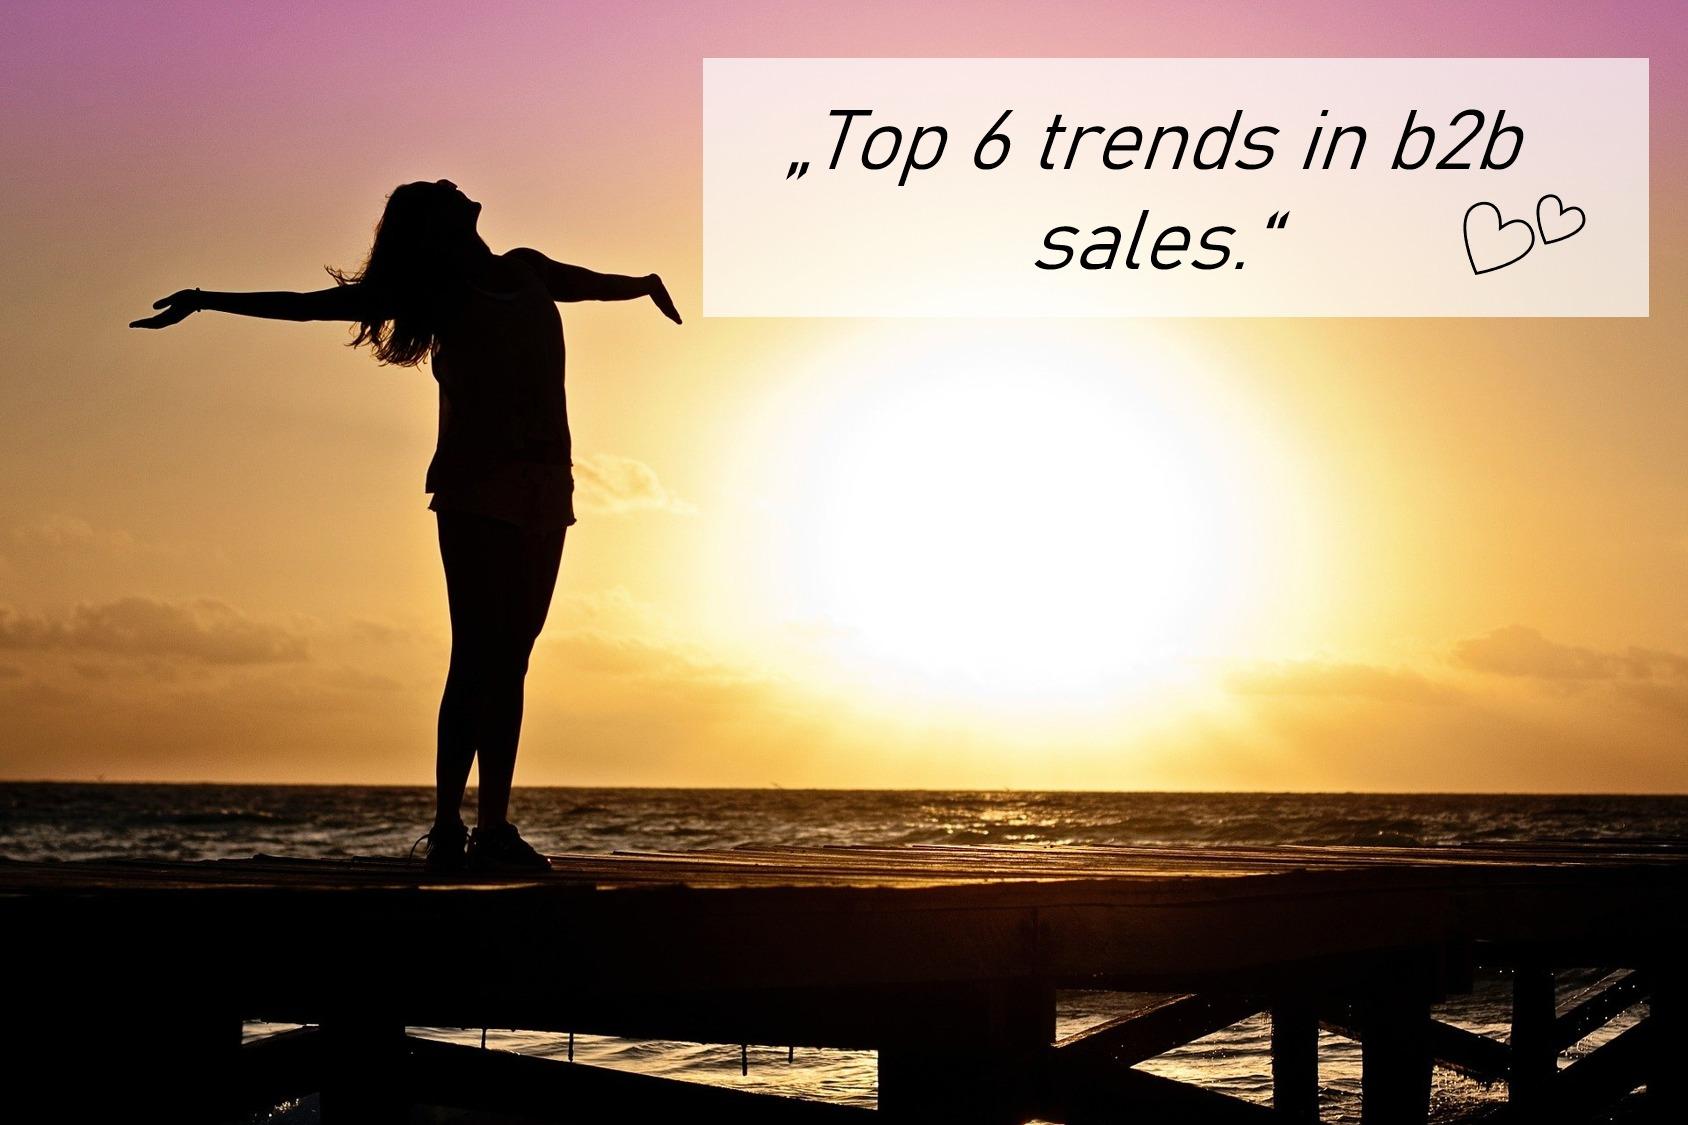 trends in b2b sales